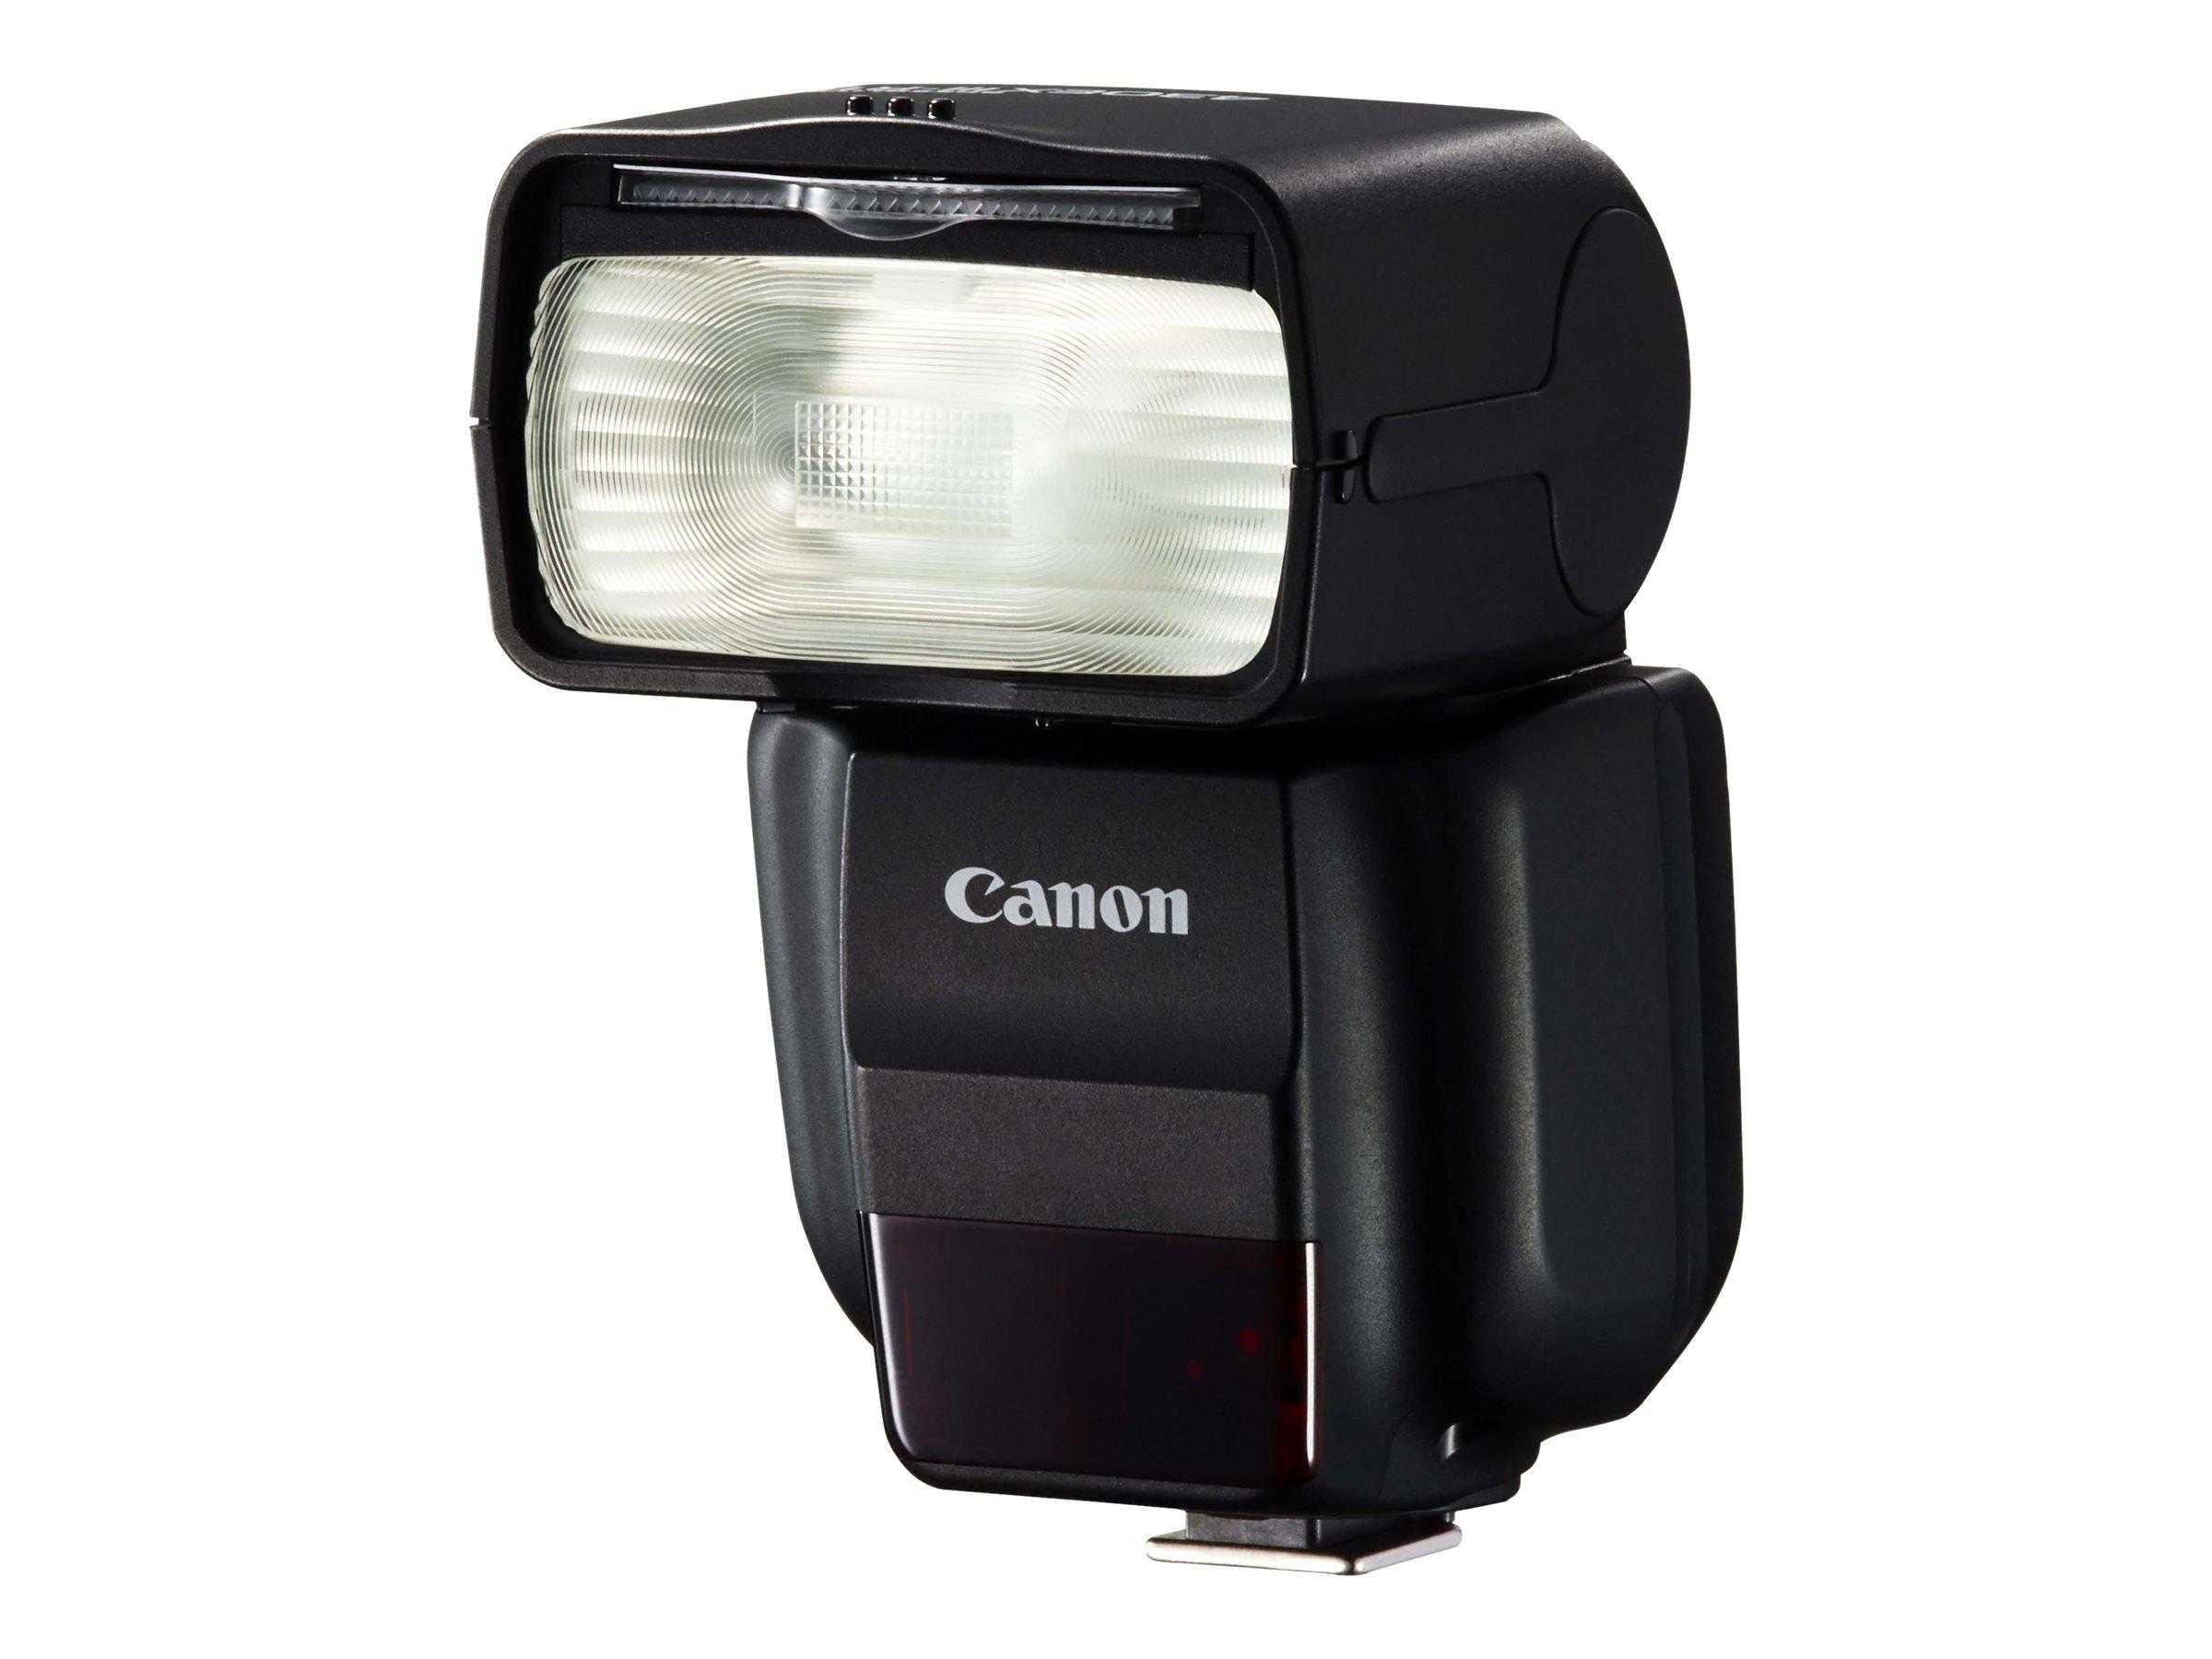 Canon Speedlite 430EX III-RT - Blitzgerät - 43 (m) - für EOS 1500, 200, 2000, 3000, 4000, Kiss X9, Kiss X90, Rebel SL2, Rebel T7